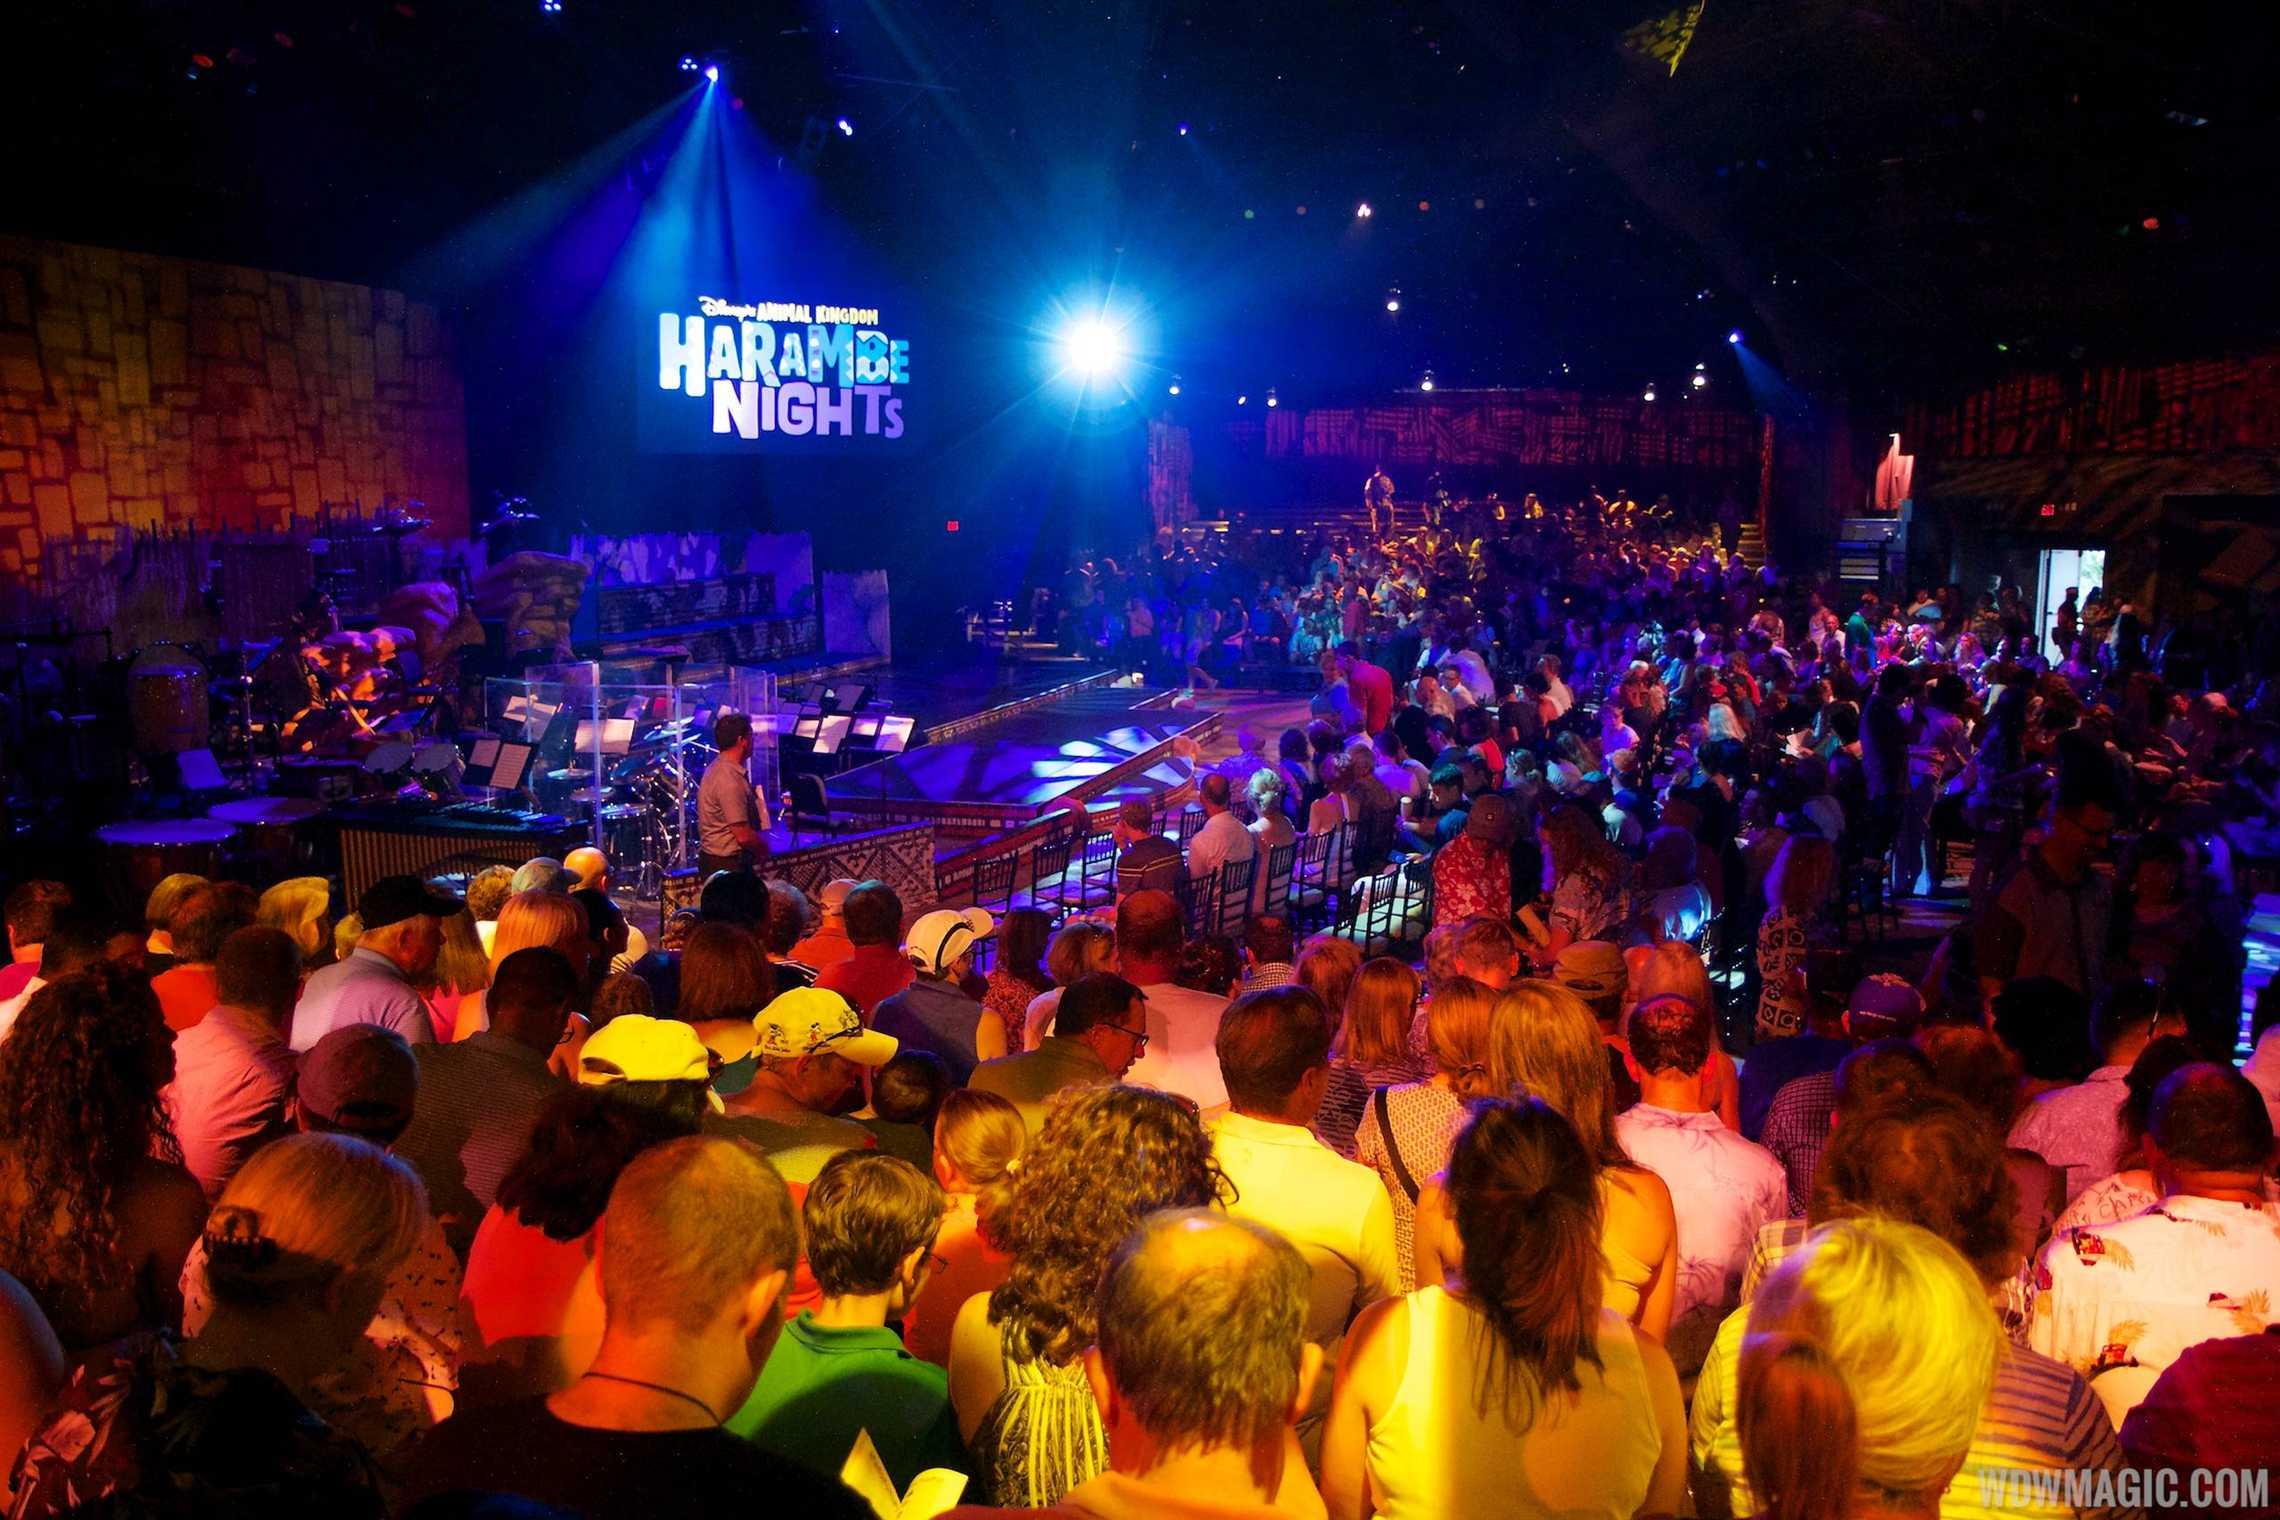 Harambe Nights - Inside the Harambe Theater